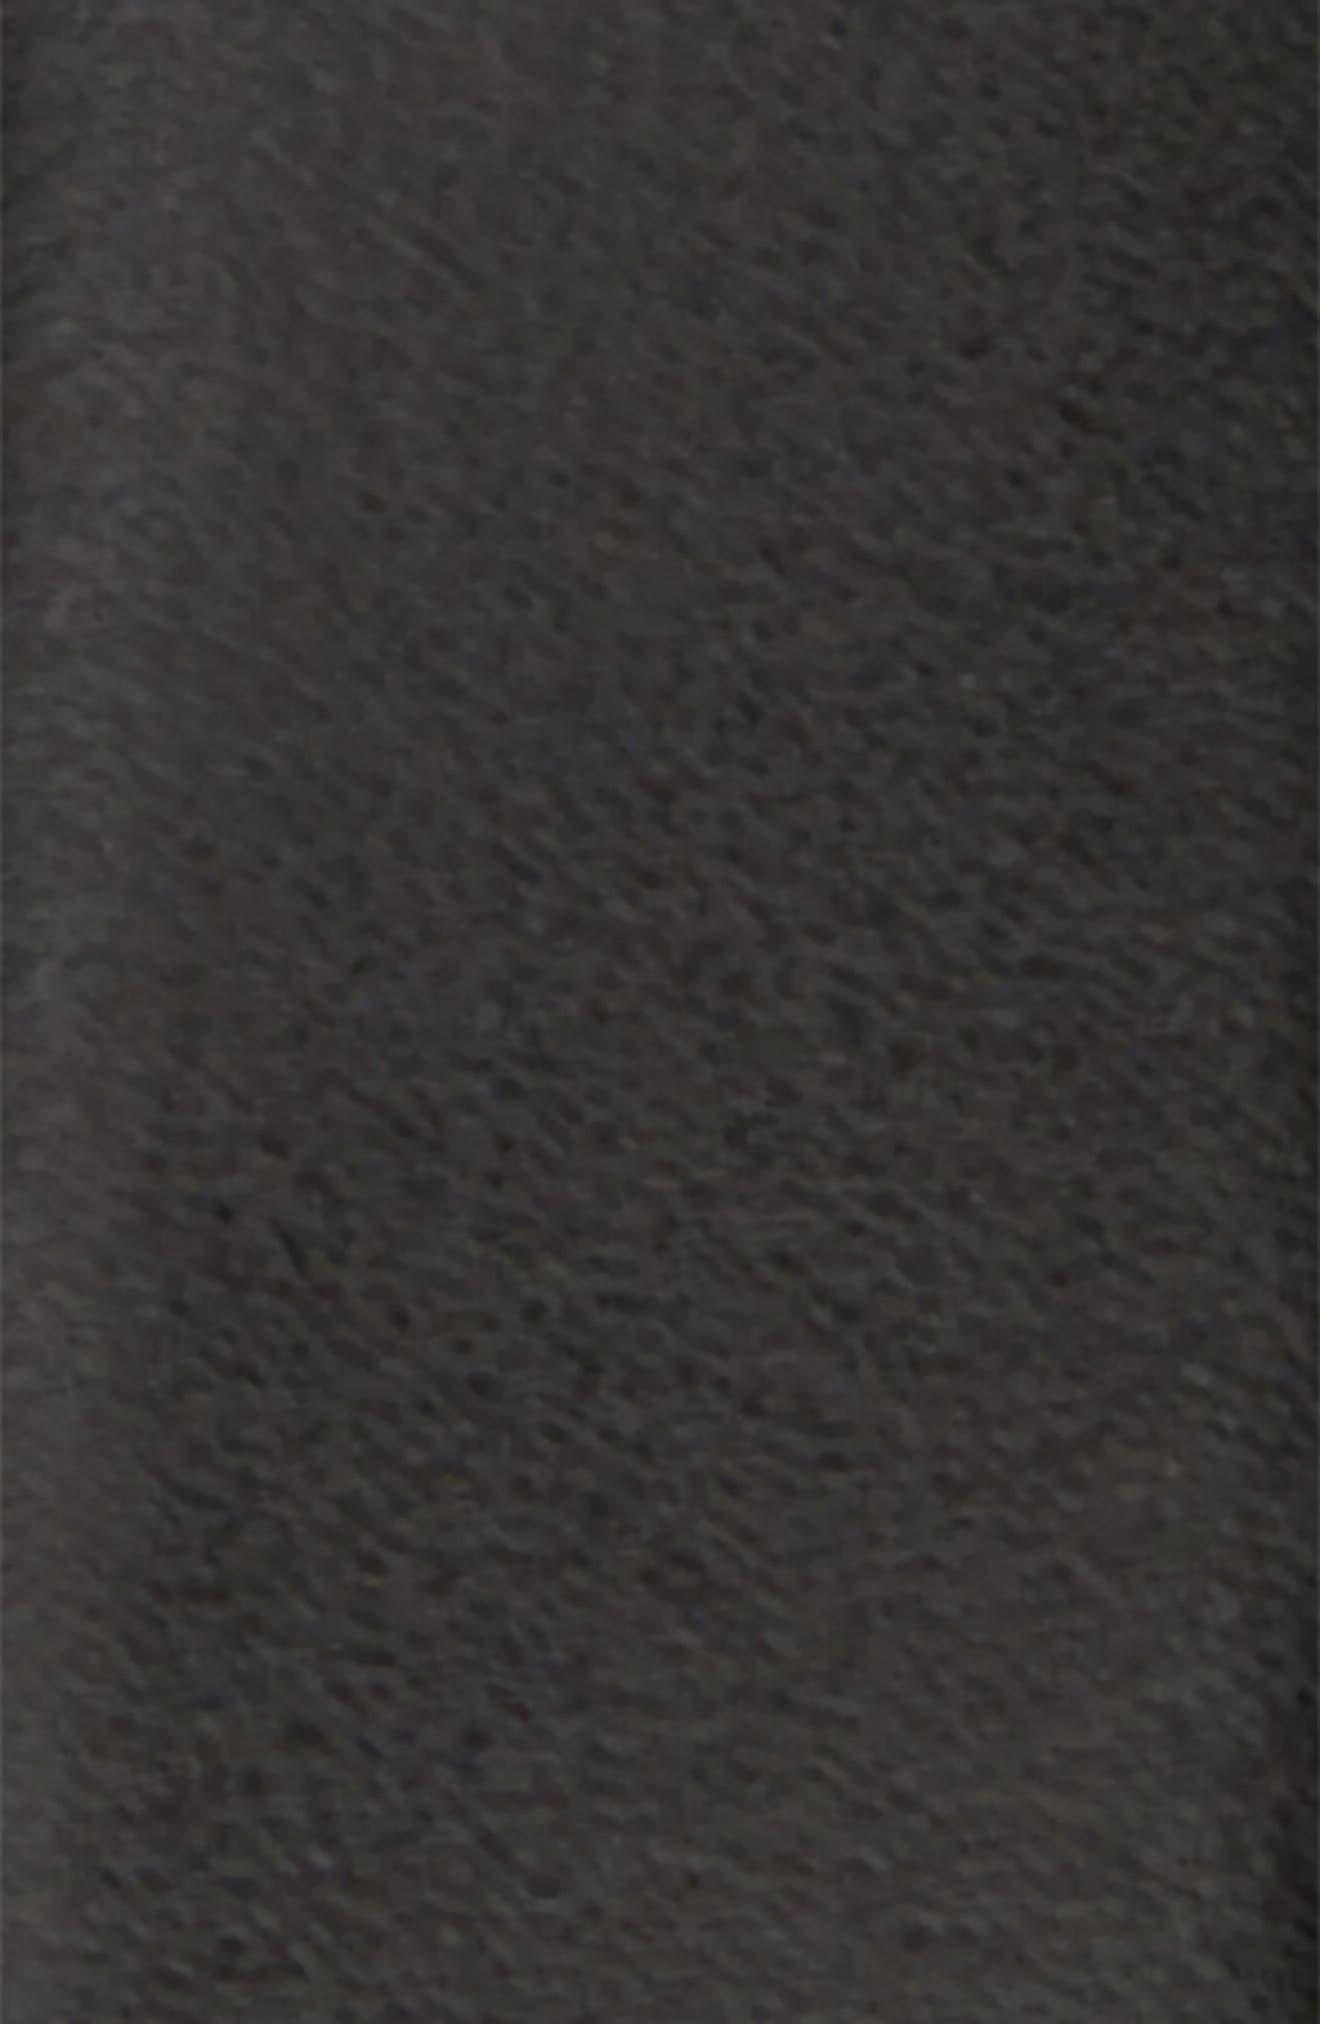 MONTBLANC, Horseshoe Buckle Reversible Leather Belt, Alternate thumbnail 3, color, BLACK/ BROWN